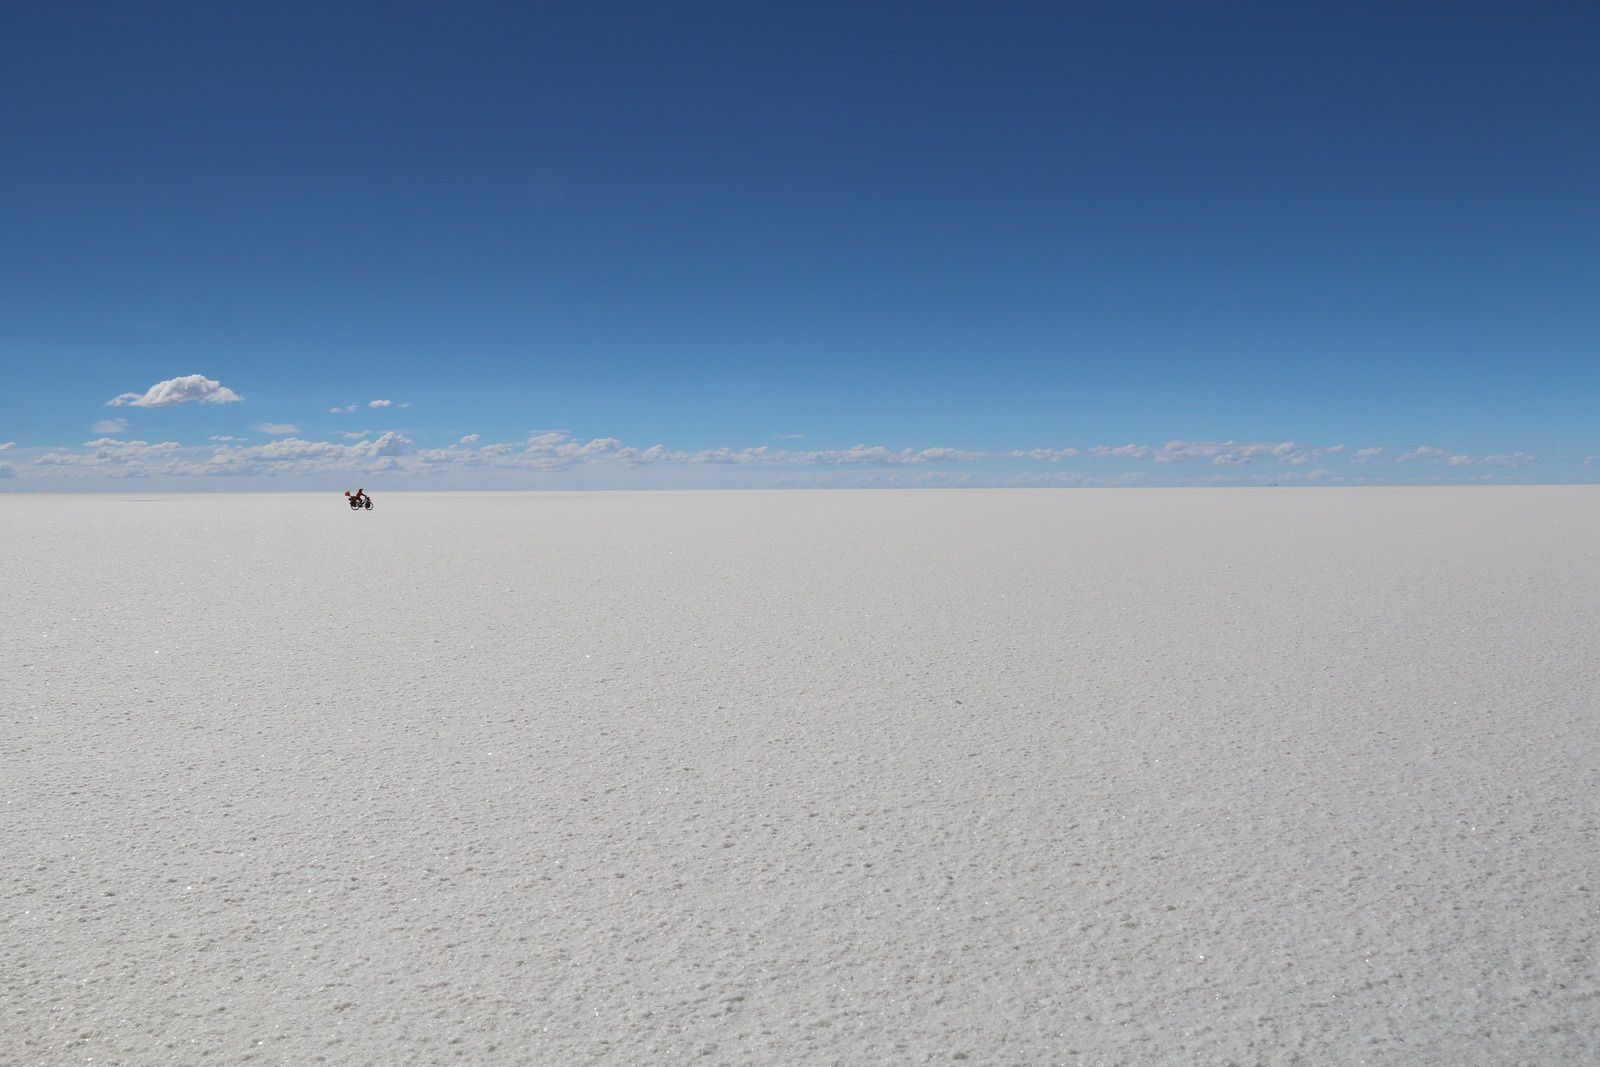 Derniers kilomètres en Bolivie